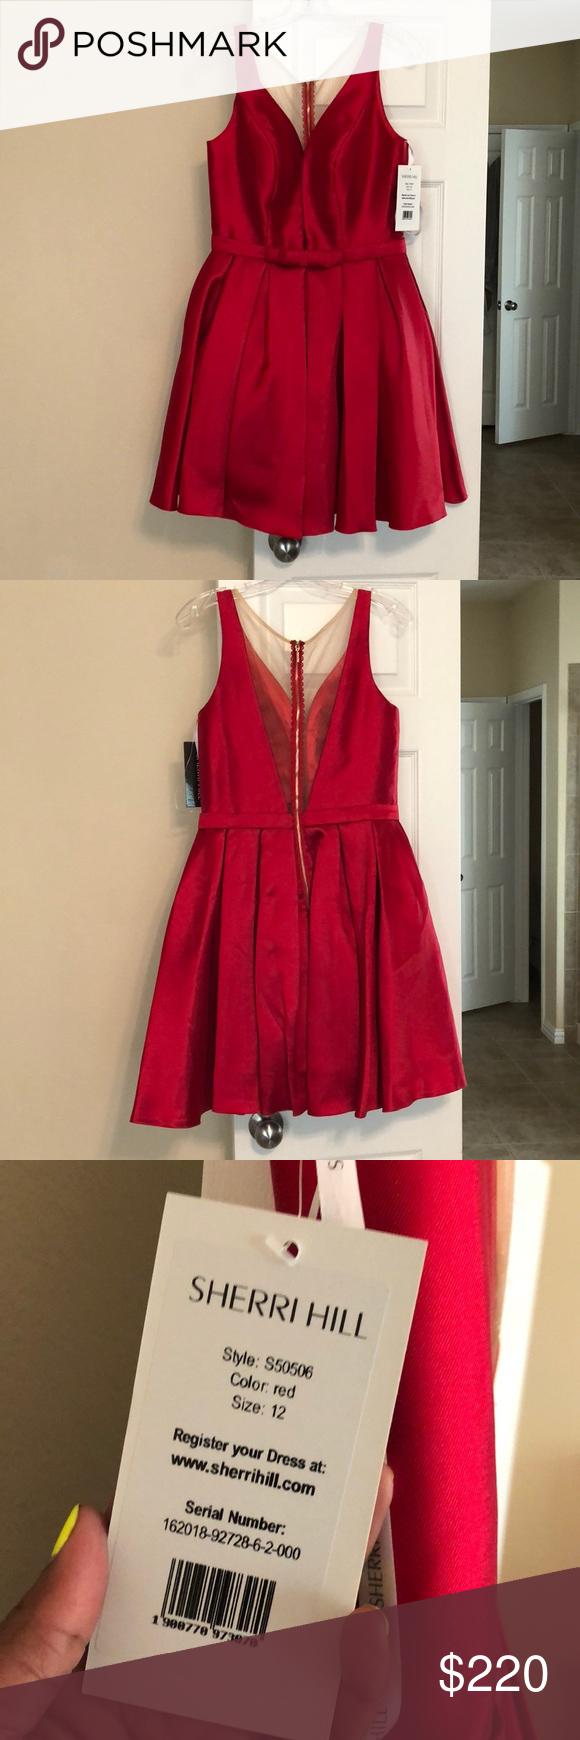 Red dress for wedding reception  Red Sherri Hill formal dress NWT  My Posh Picks  Pinterest